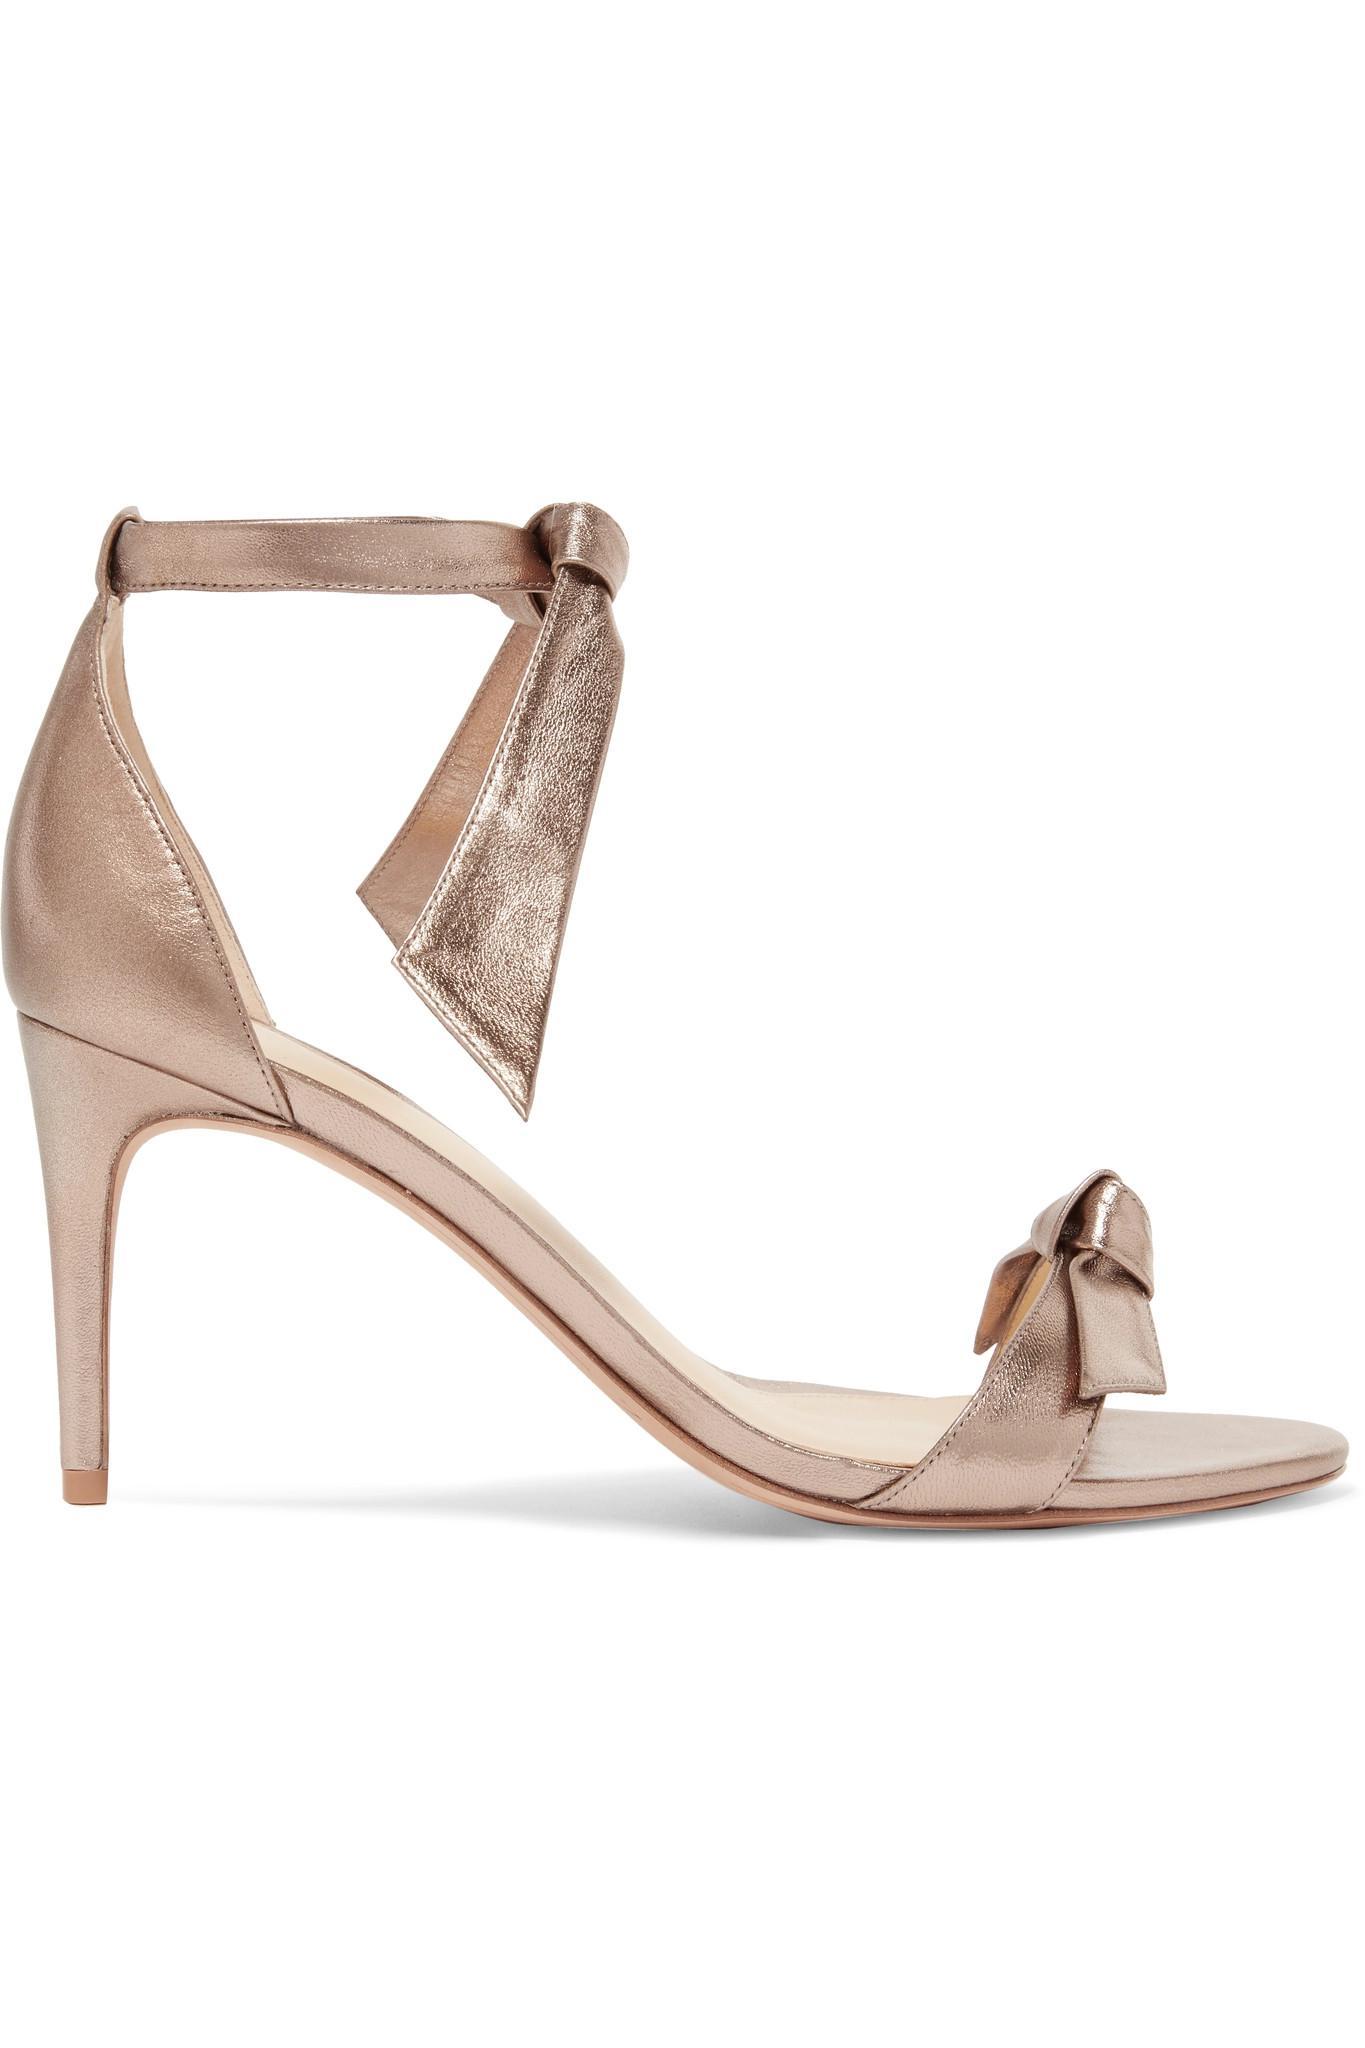 embellished sandals - Metallic Alexandre Birman ODFCN